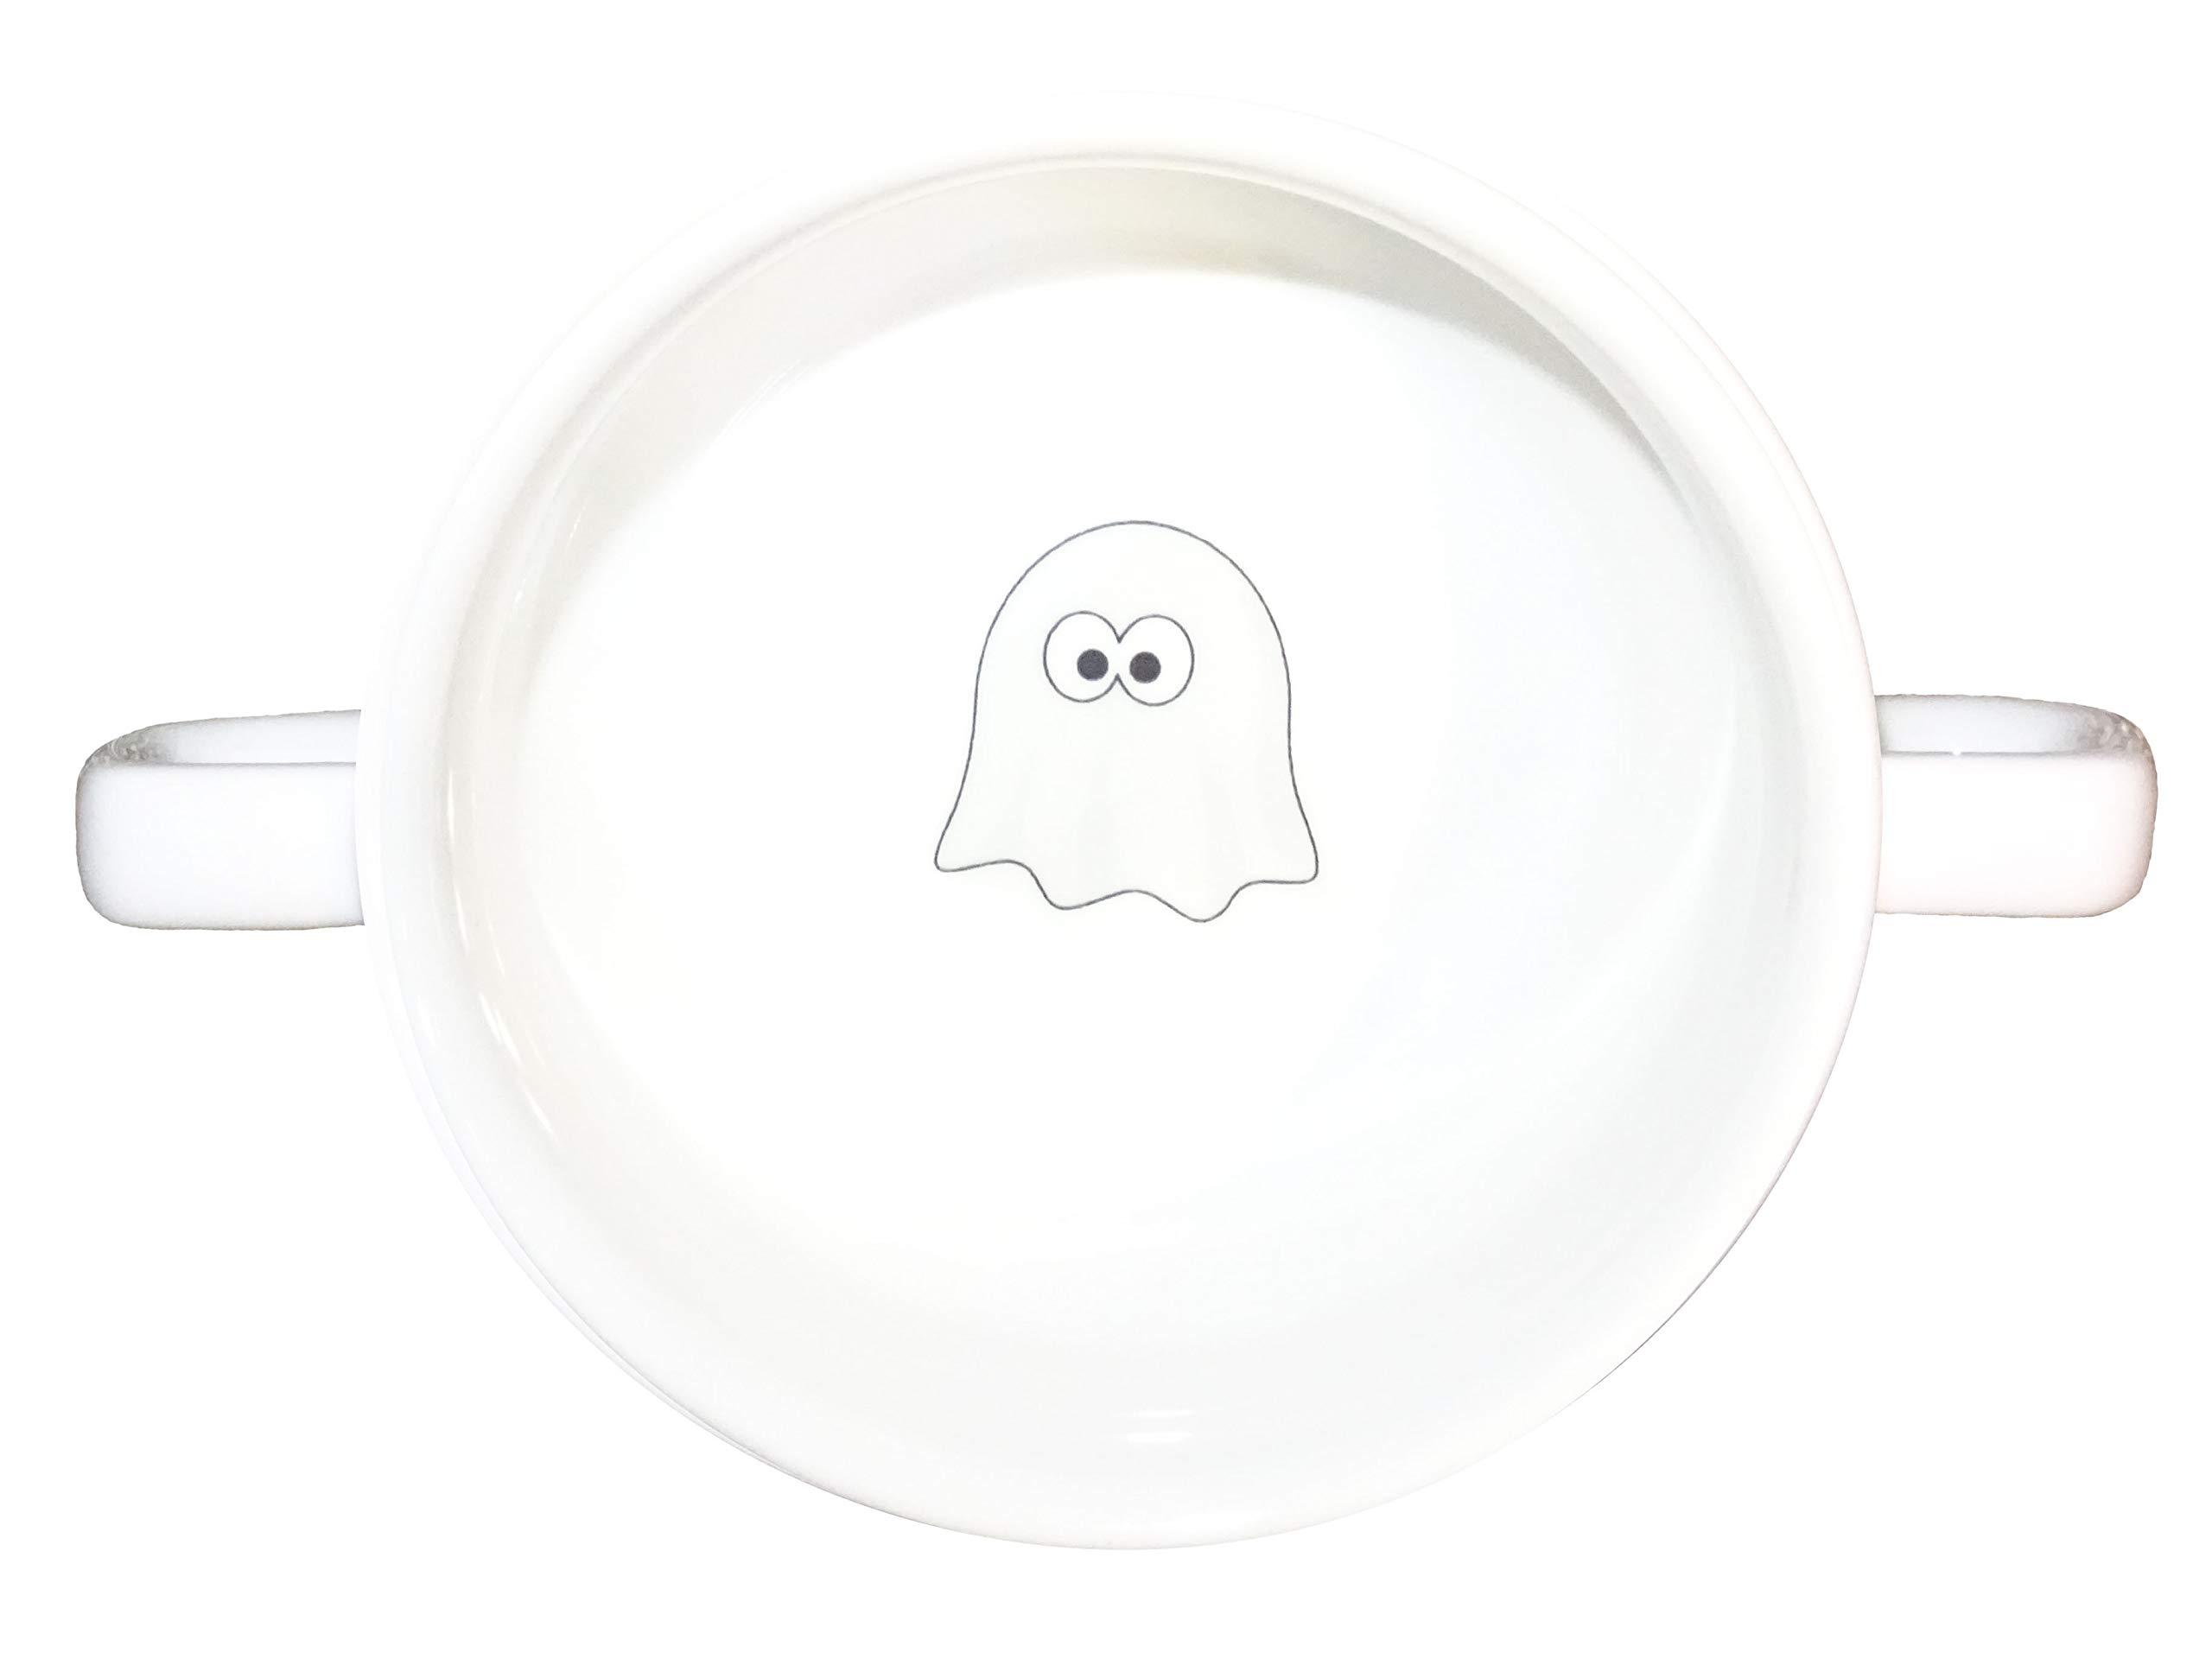 Soup Bowl 20, 1 pcs, Ghost Smiley Soup Bowl Small Baby Child Kids, Bottom, Hidden Message, Secret Message, Animal, Cartoon, Cute Animals, Kids, Porcelain